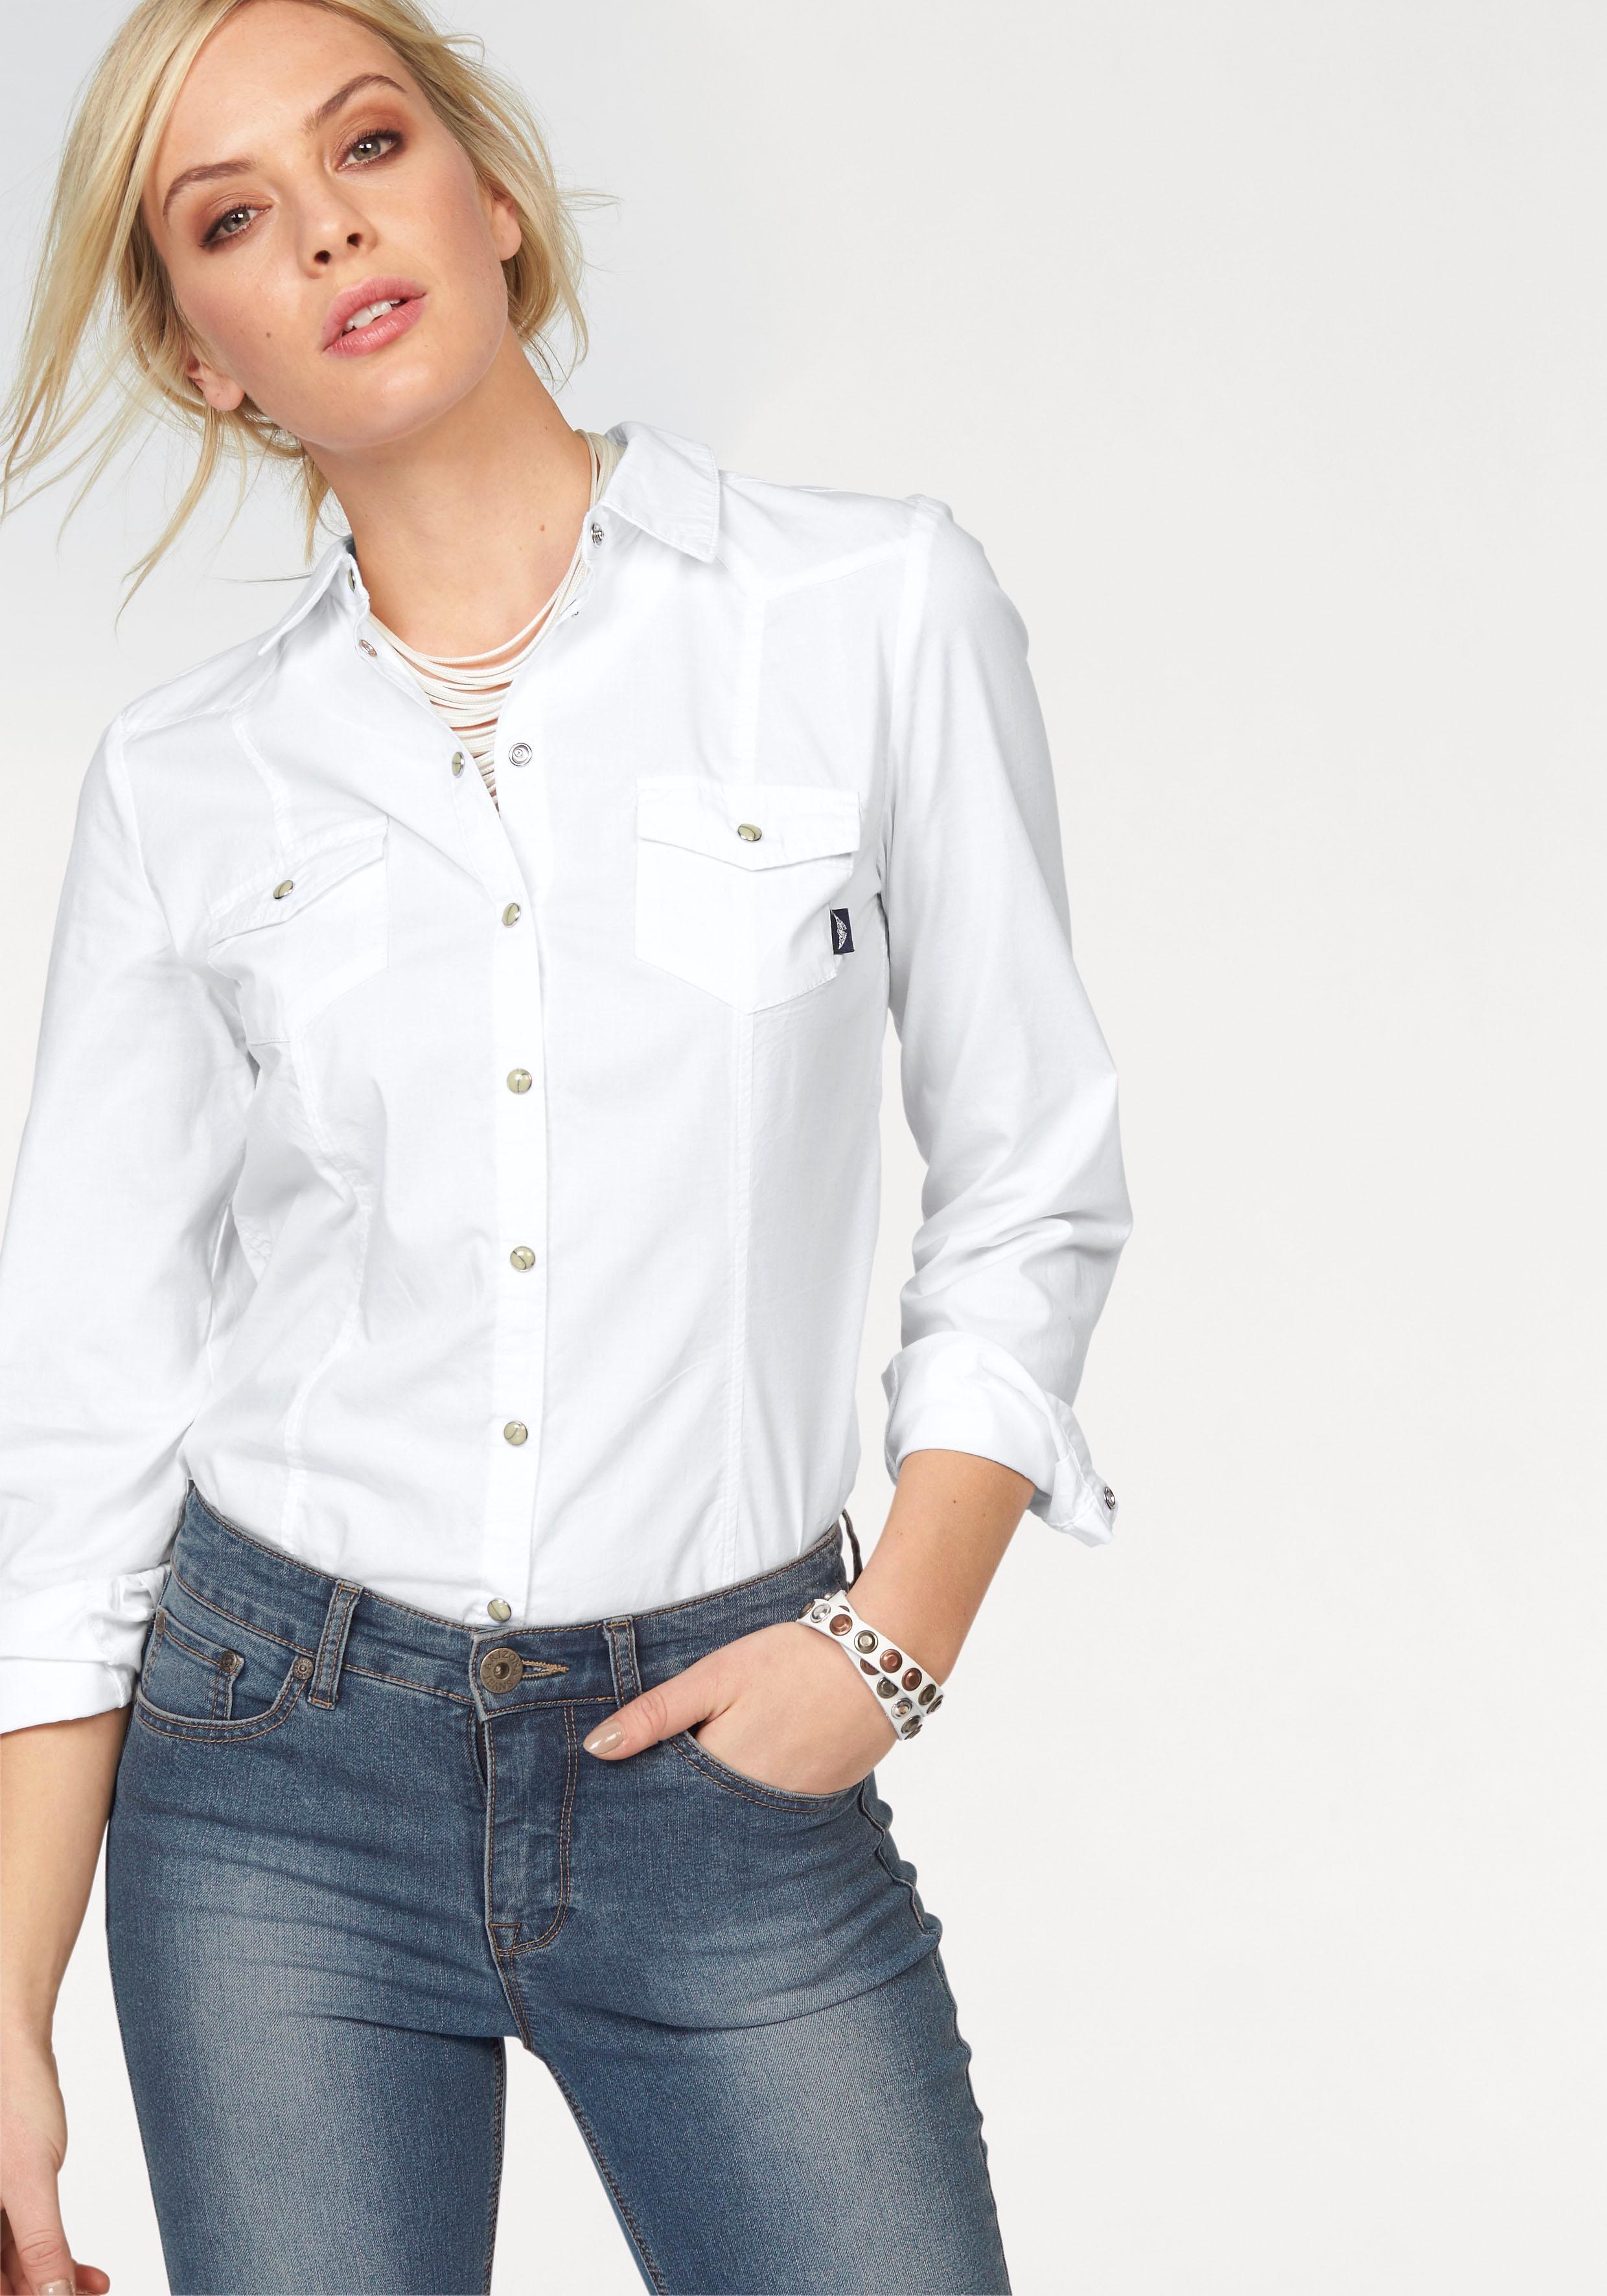 Kopen Online Trendkleuren Arizona In Jeansoverhemd tsQdrCh